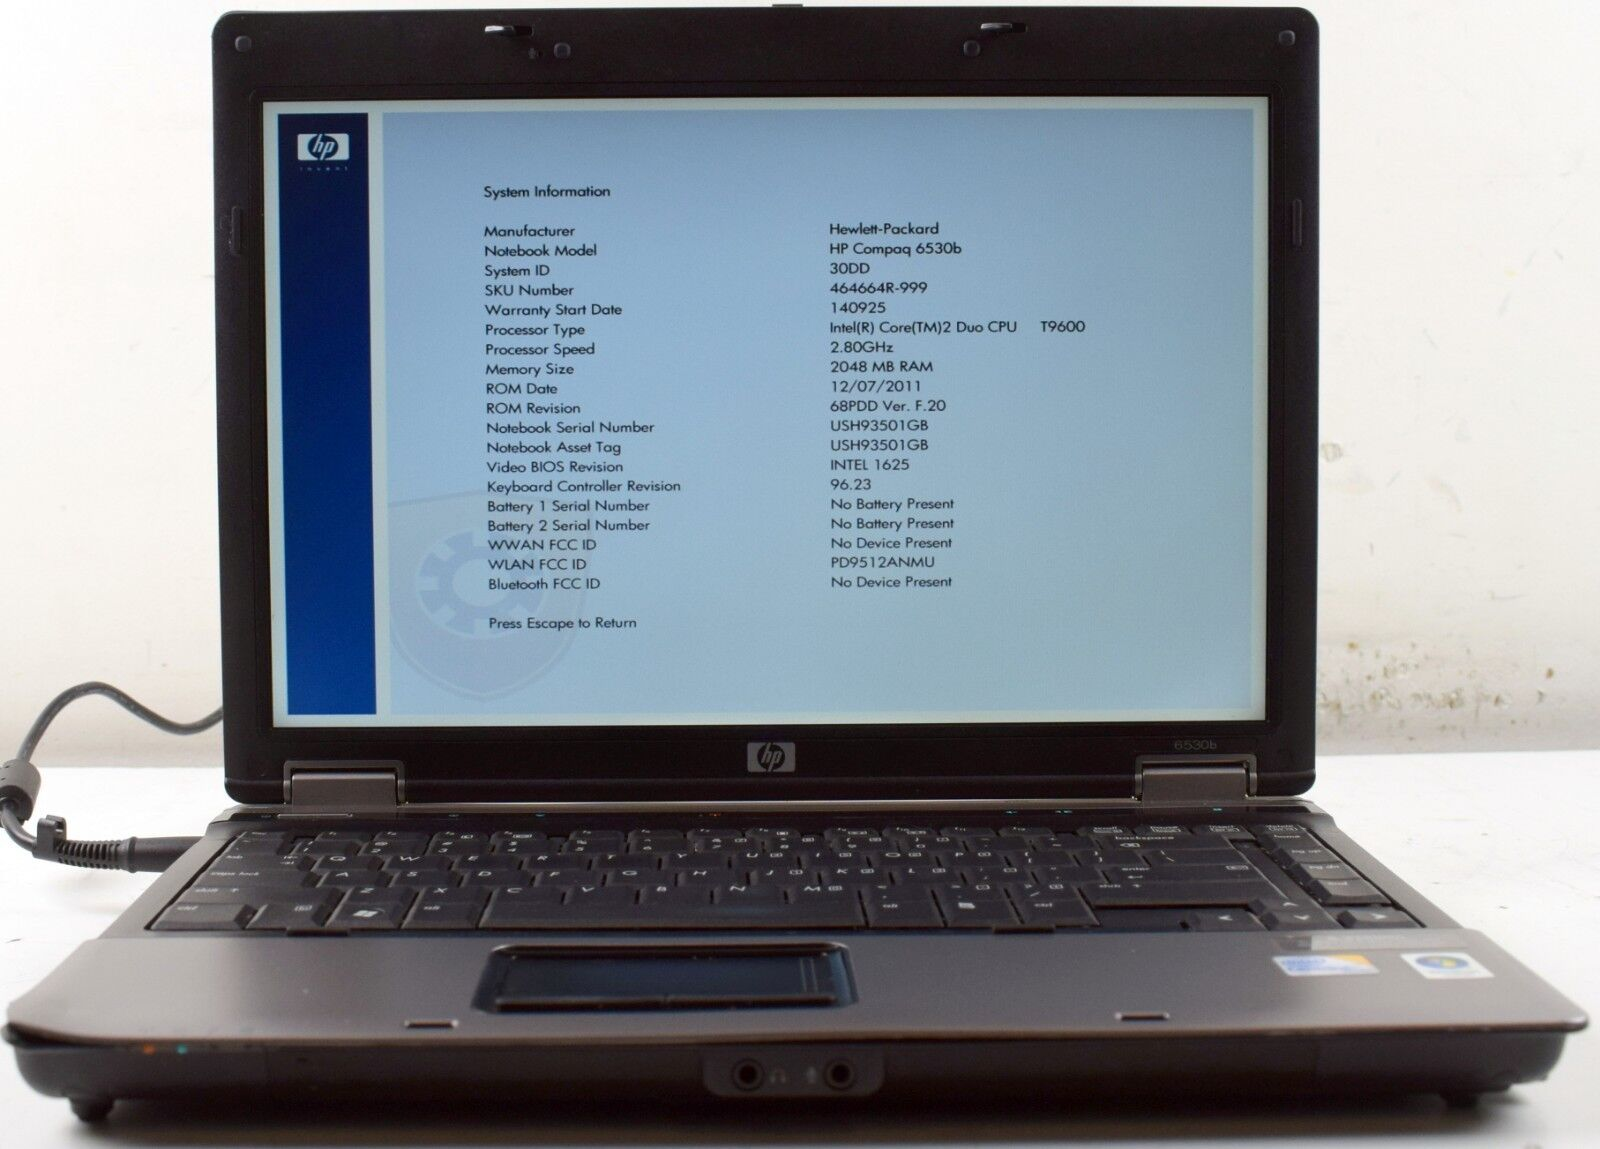 HP NOTEBOOKS 68PDD WINDOWS XP DRIVER DOWNLOAD